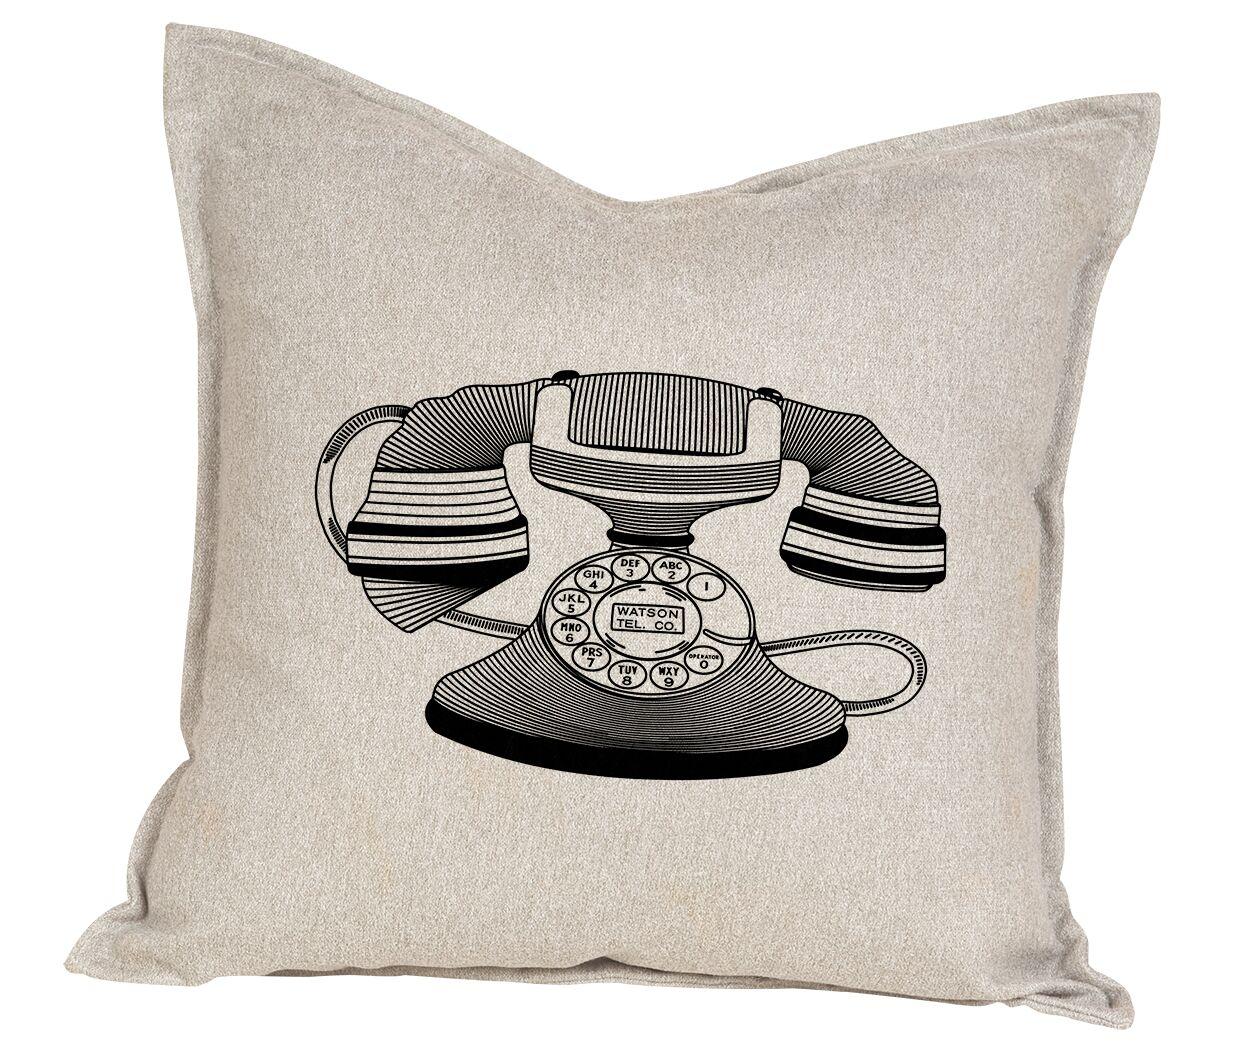 Hendren Telephone Cotton Throw Pillow